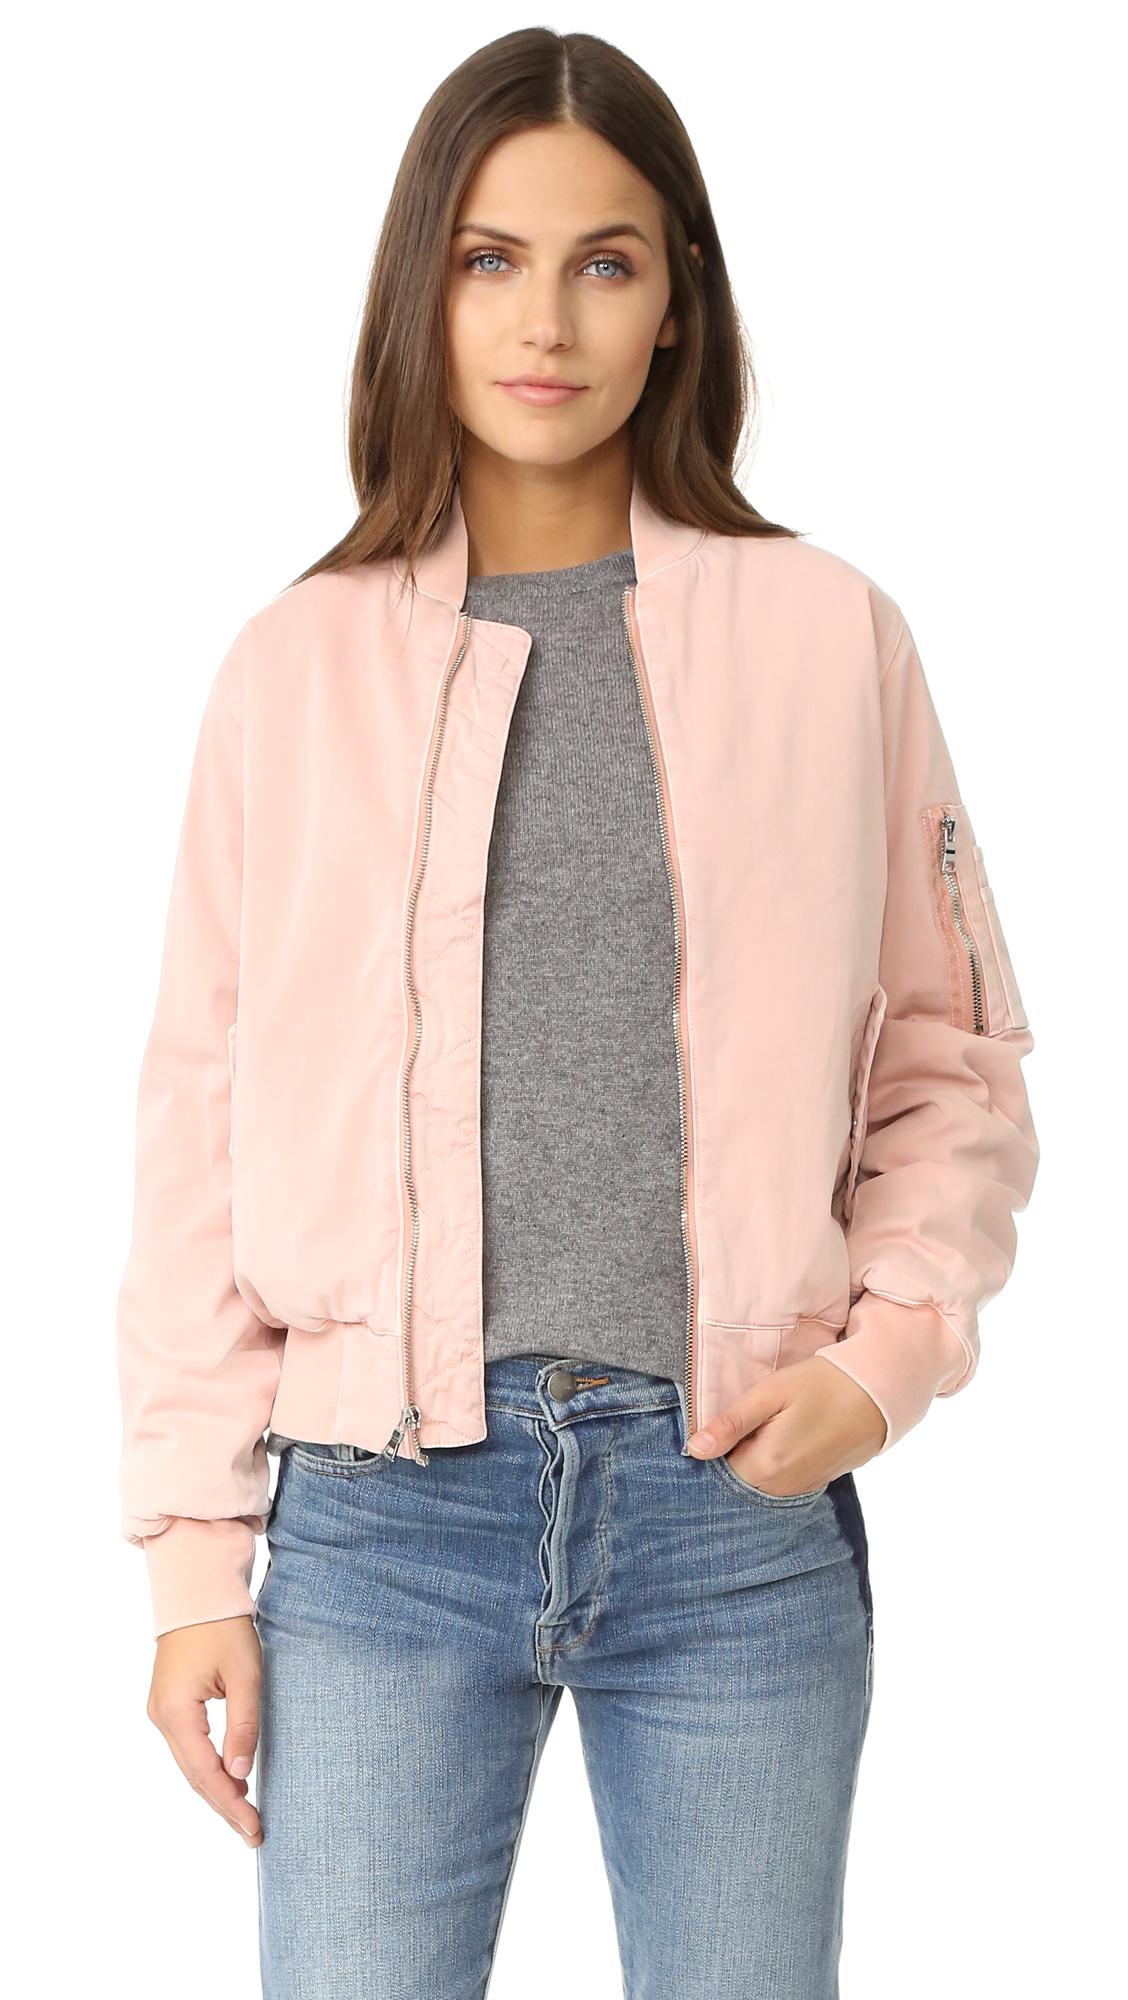 Hudson Gene Puffy Bomber - Sunkissed Pink Destructed at Shopbop